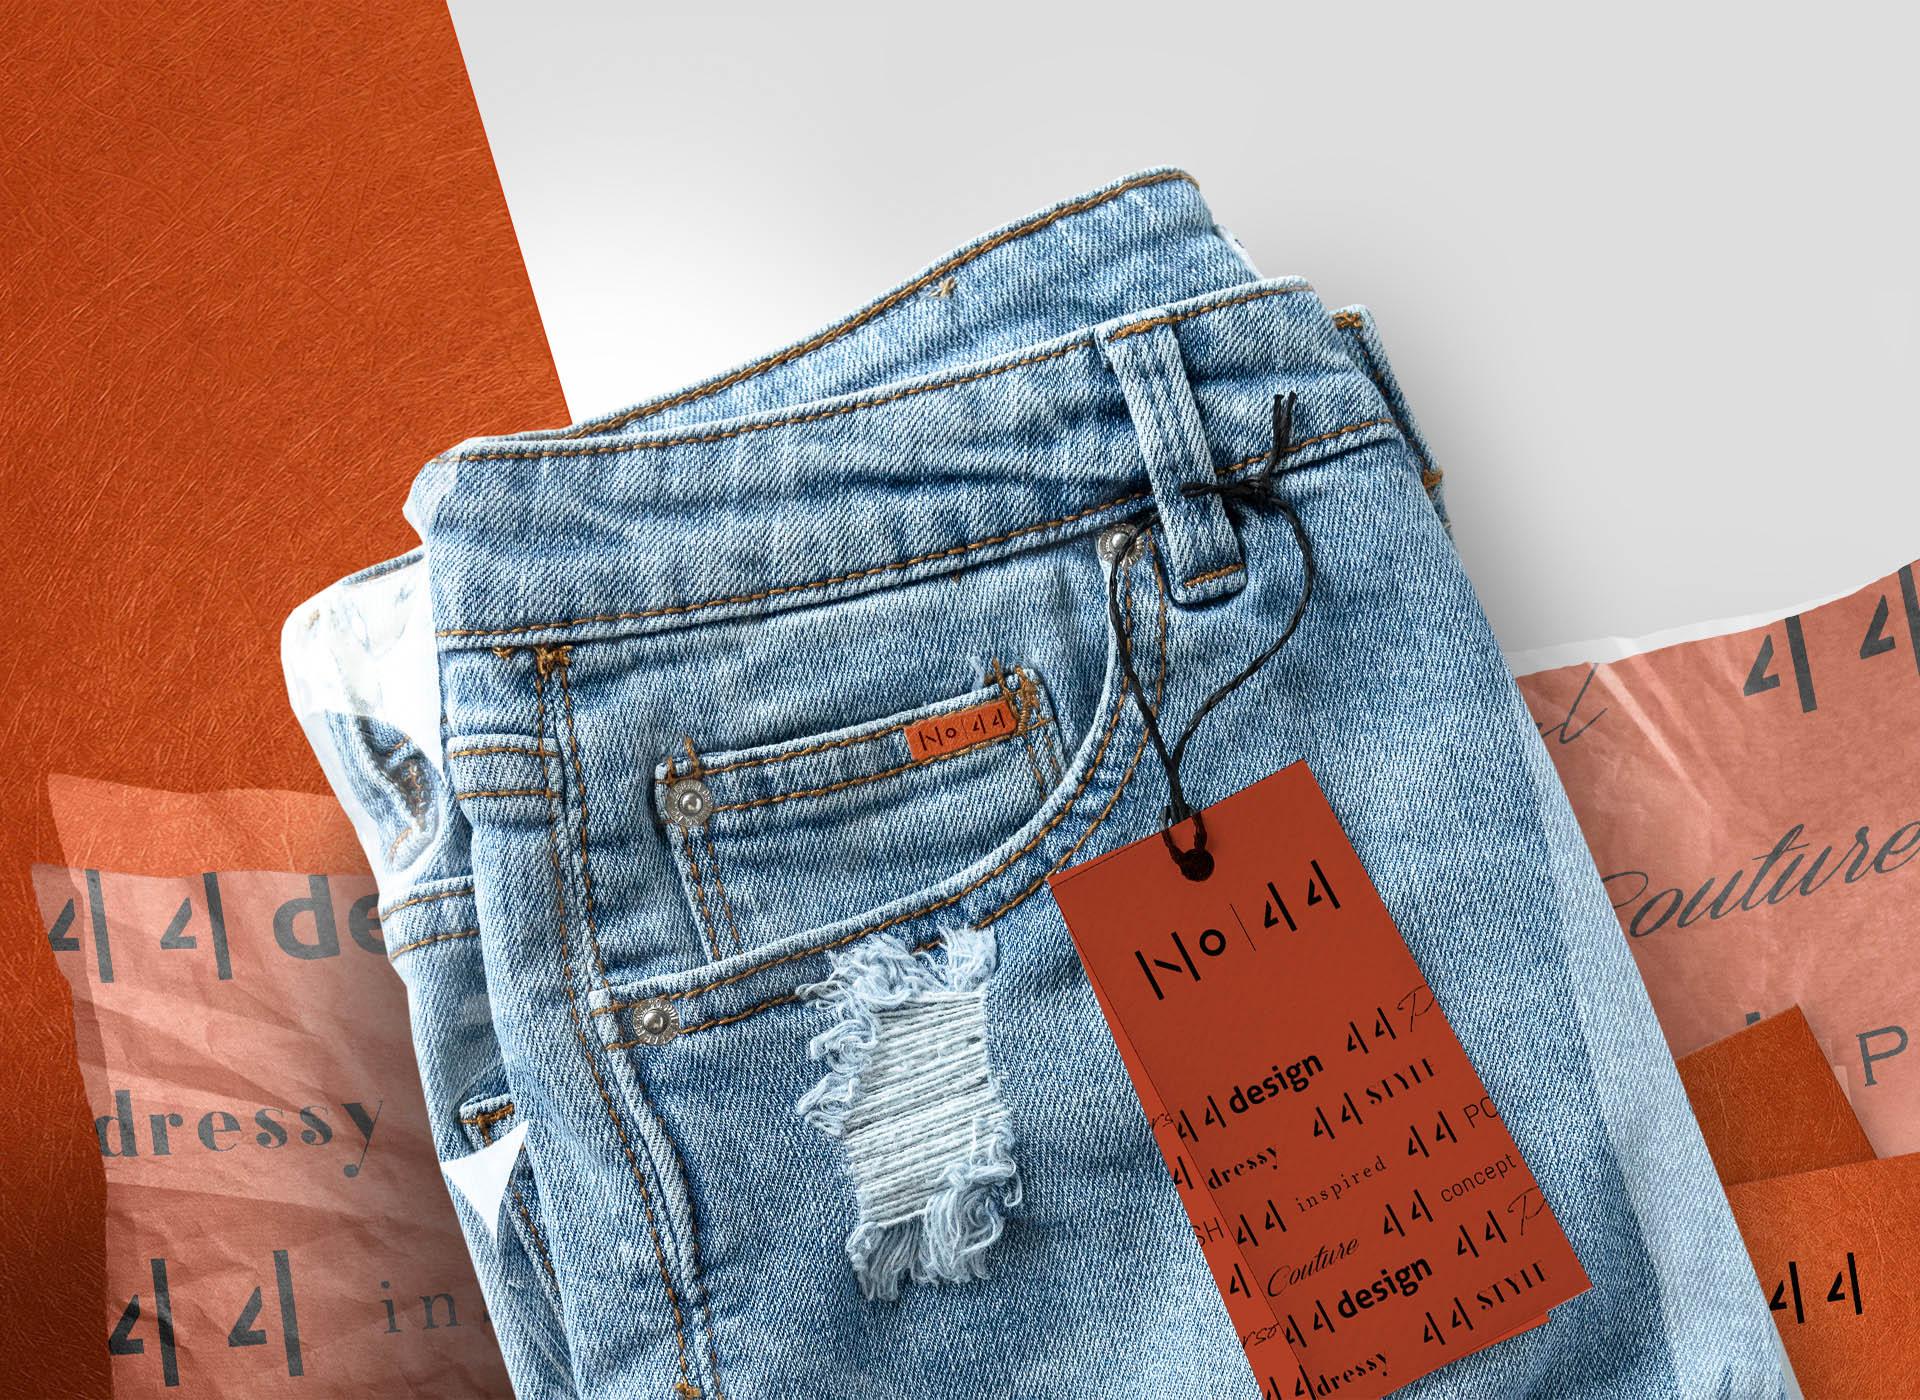 NO44 portofoliu inoveo jeans